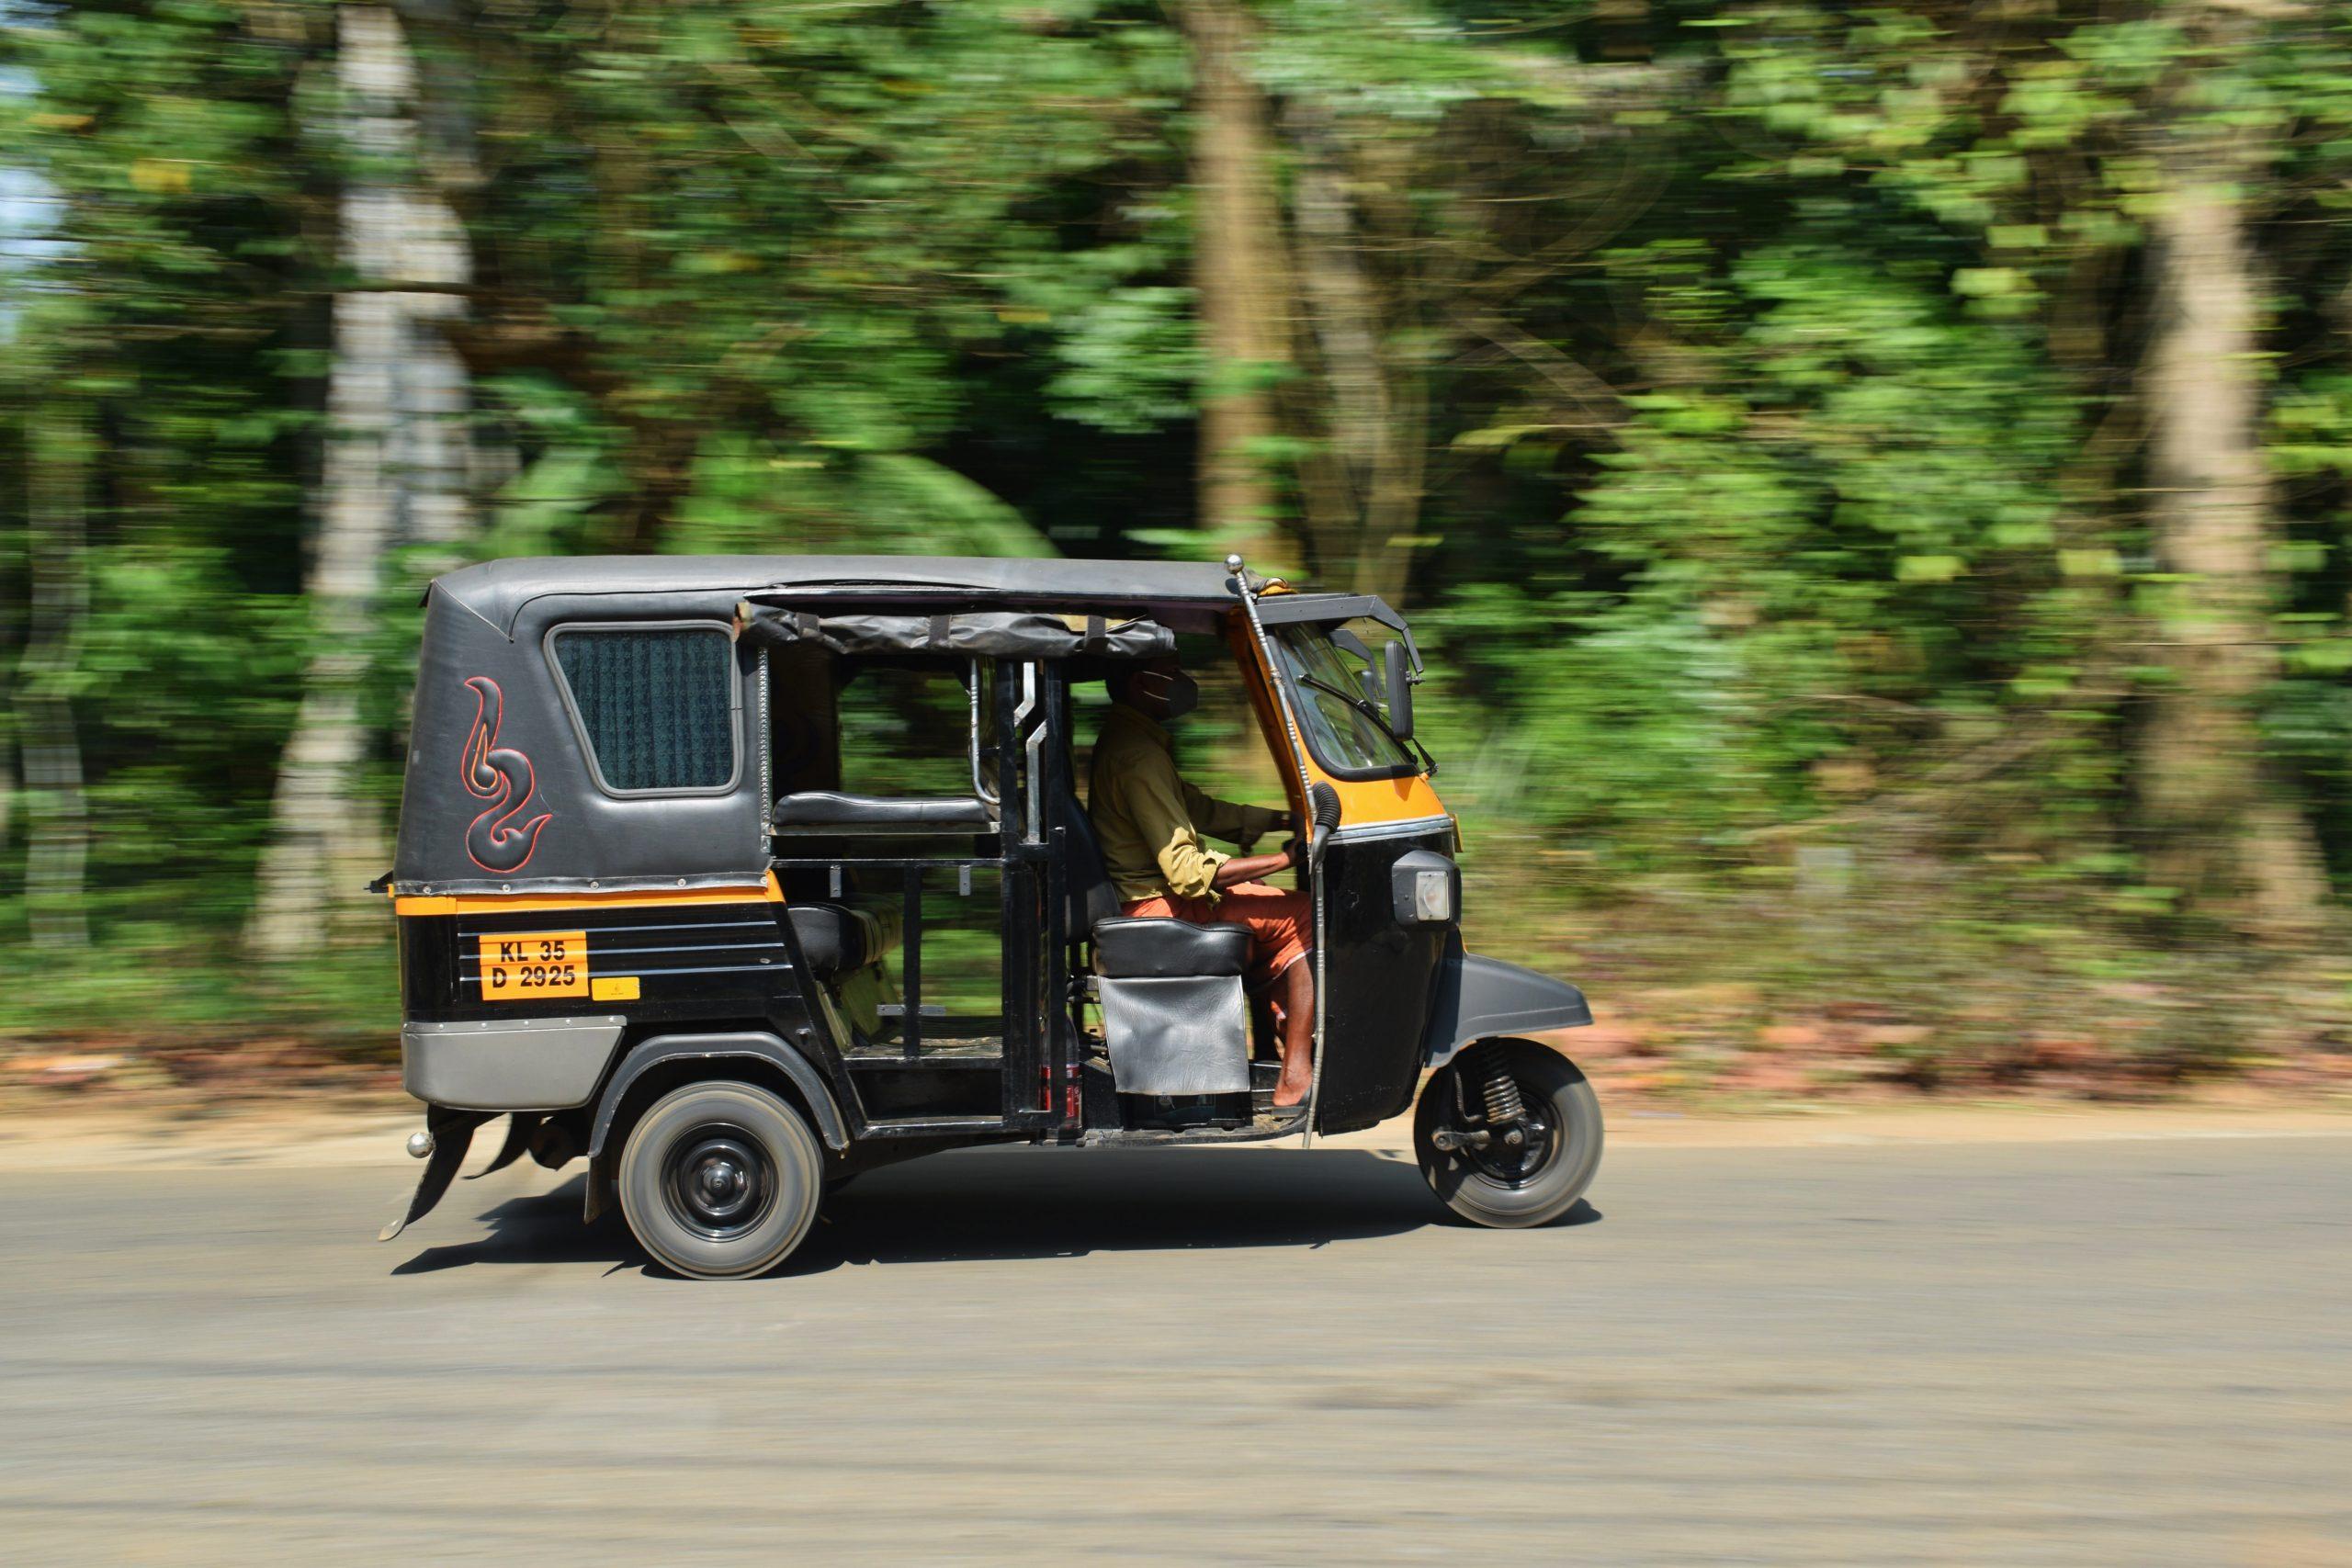 Panning shot of a Auto rickshaw on road